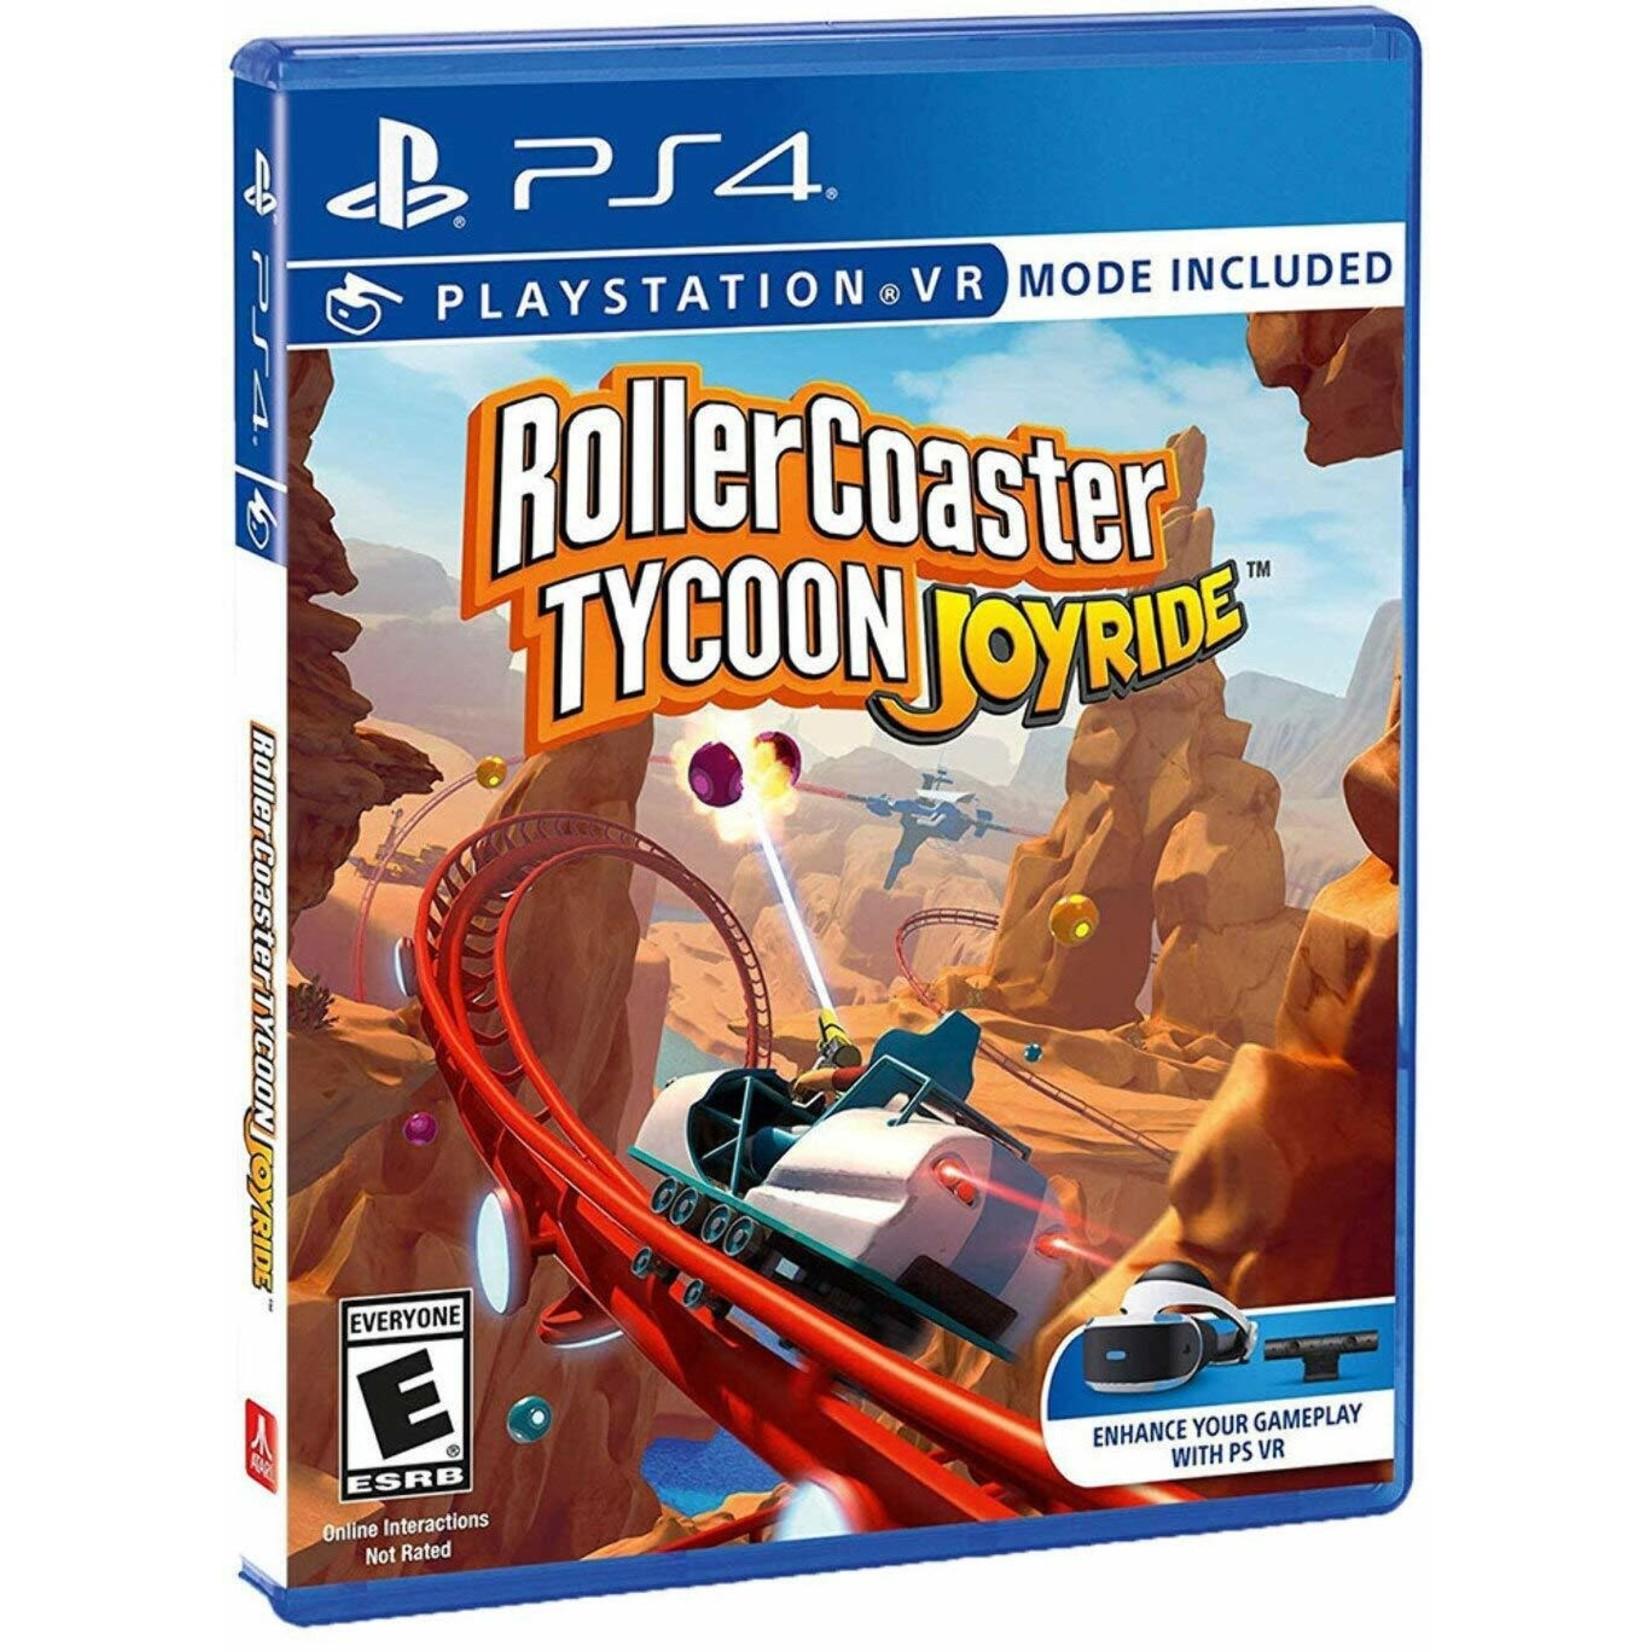 PS4-Roller Coaster Tycoon Joyride